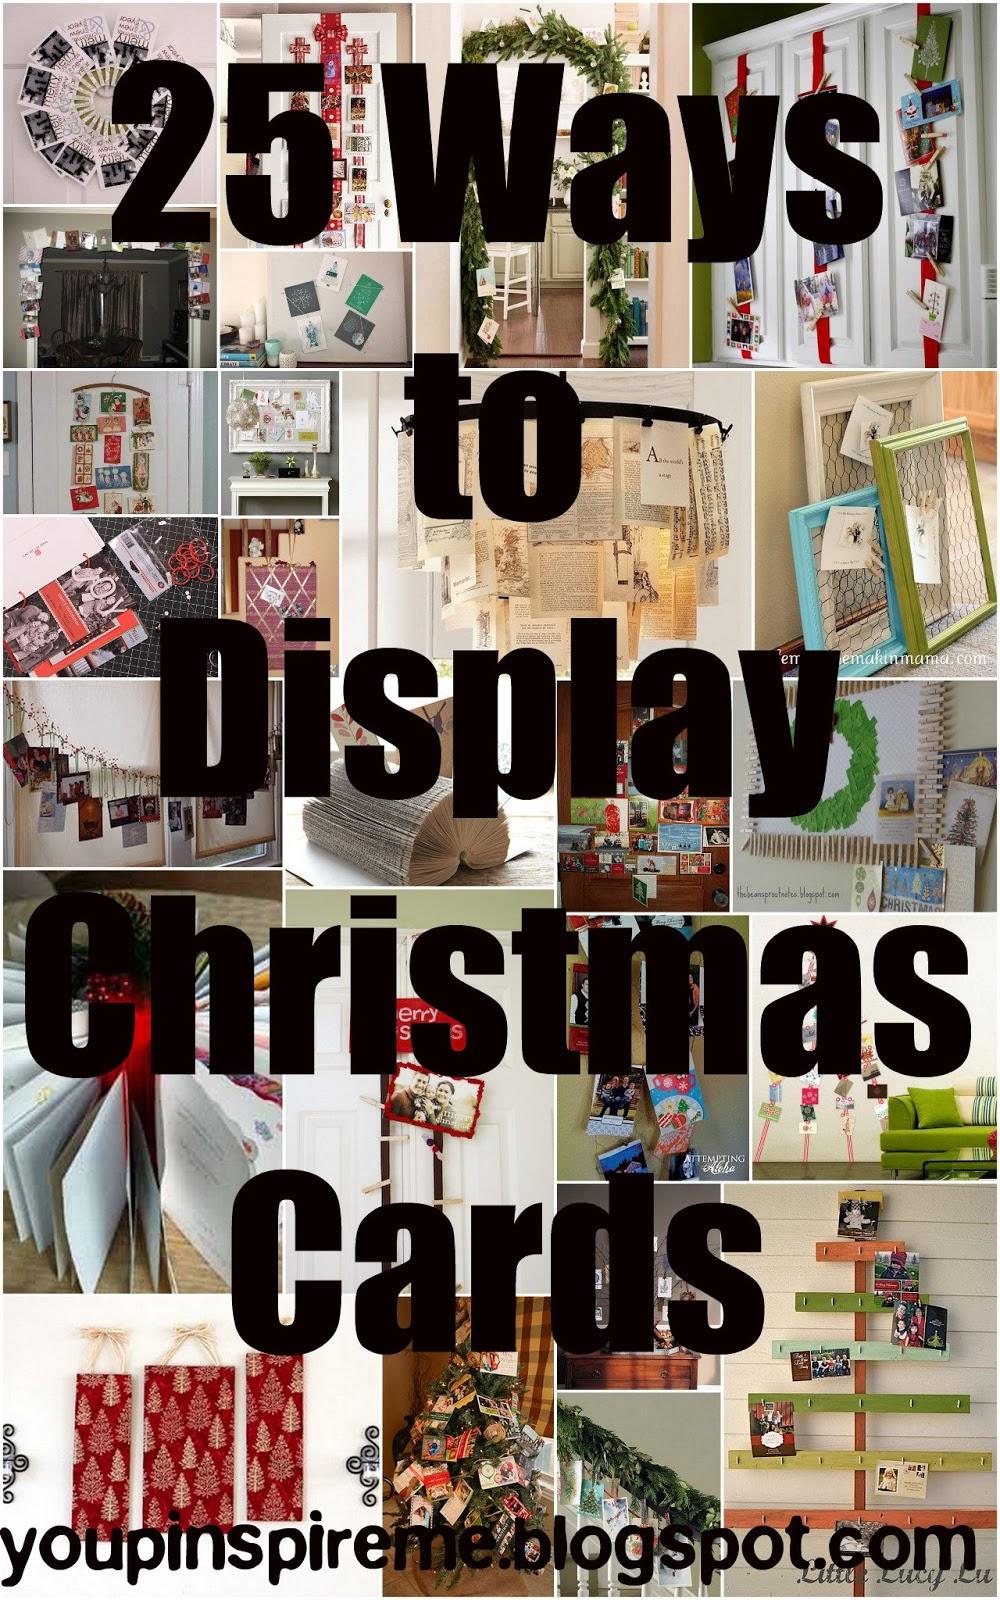 You pinspire me 25 ways to display christmas cards - Christmas card display ideas ...